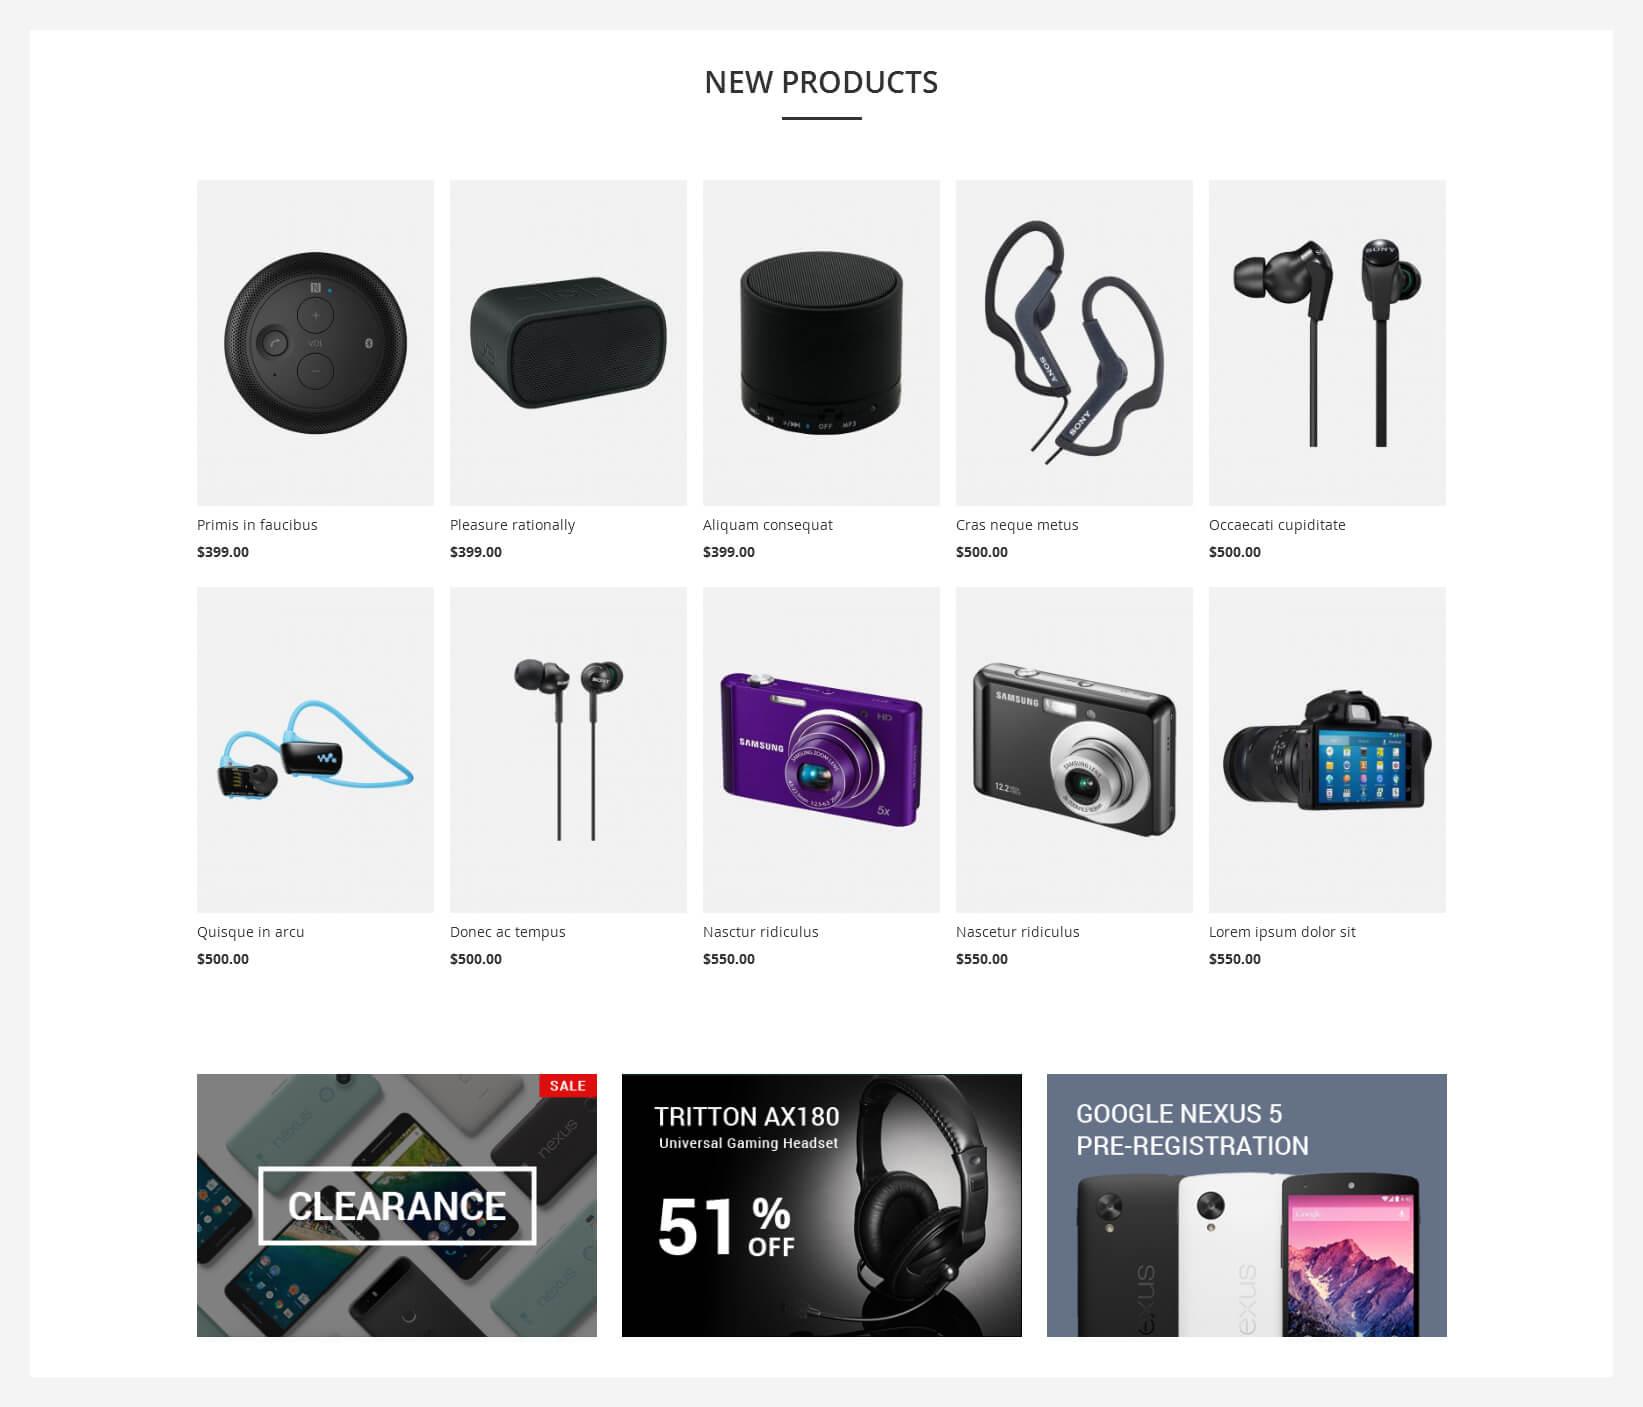 kosmic magento 2 theme new products